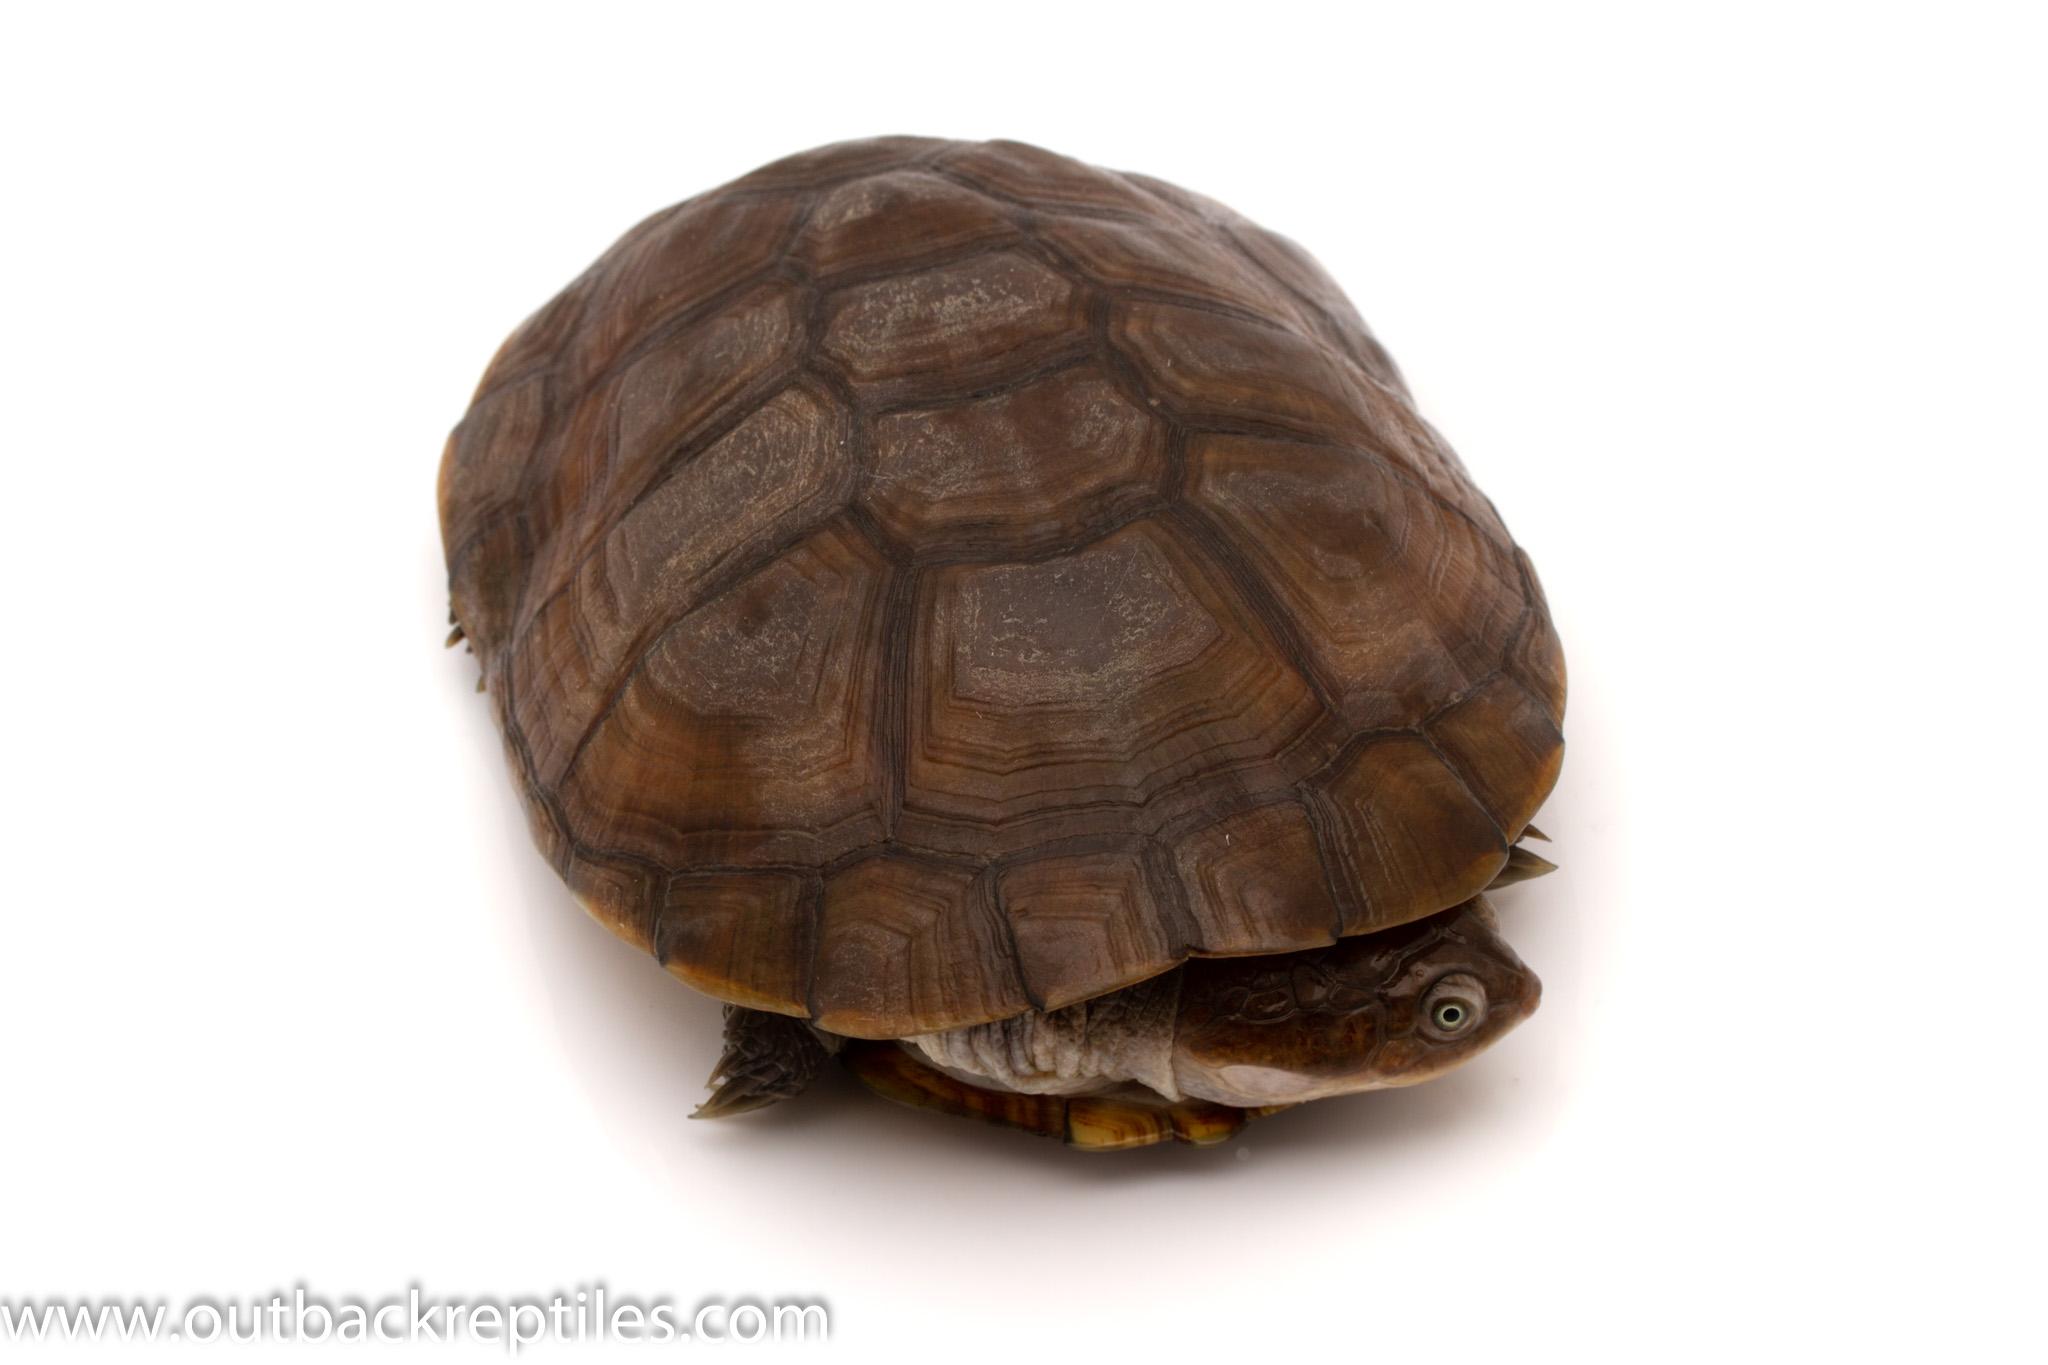 african sideneck turtles for sale